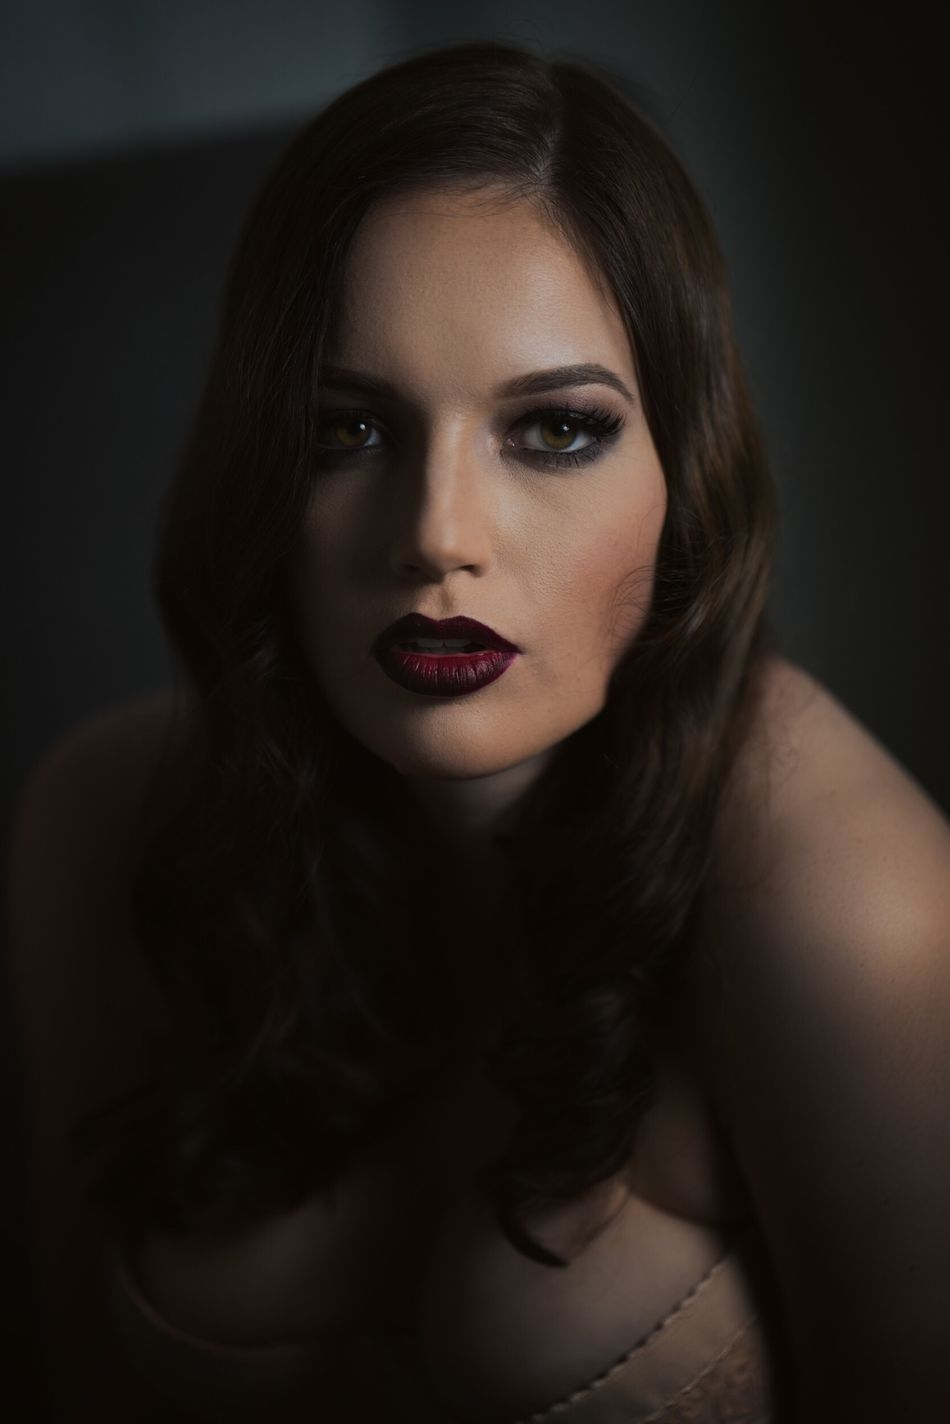 Beautiful stock photos of augen, beautiful woman, close-up, beauty, make-up